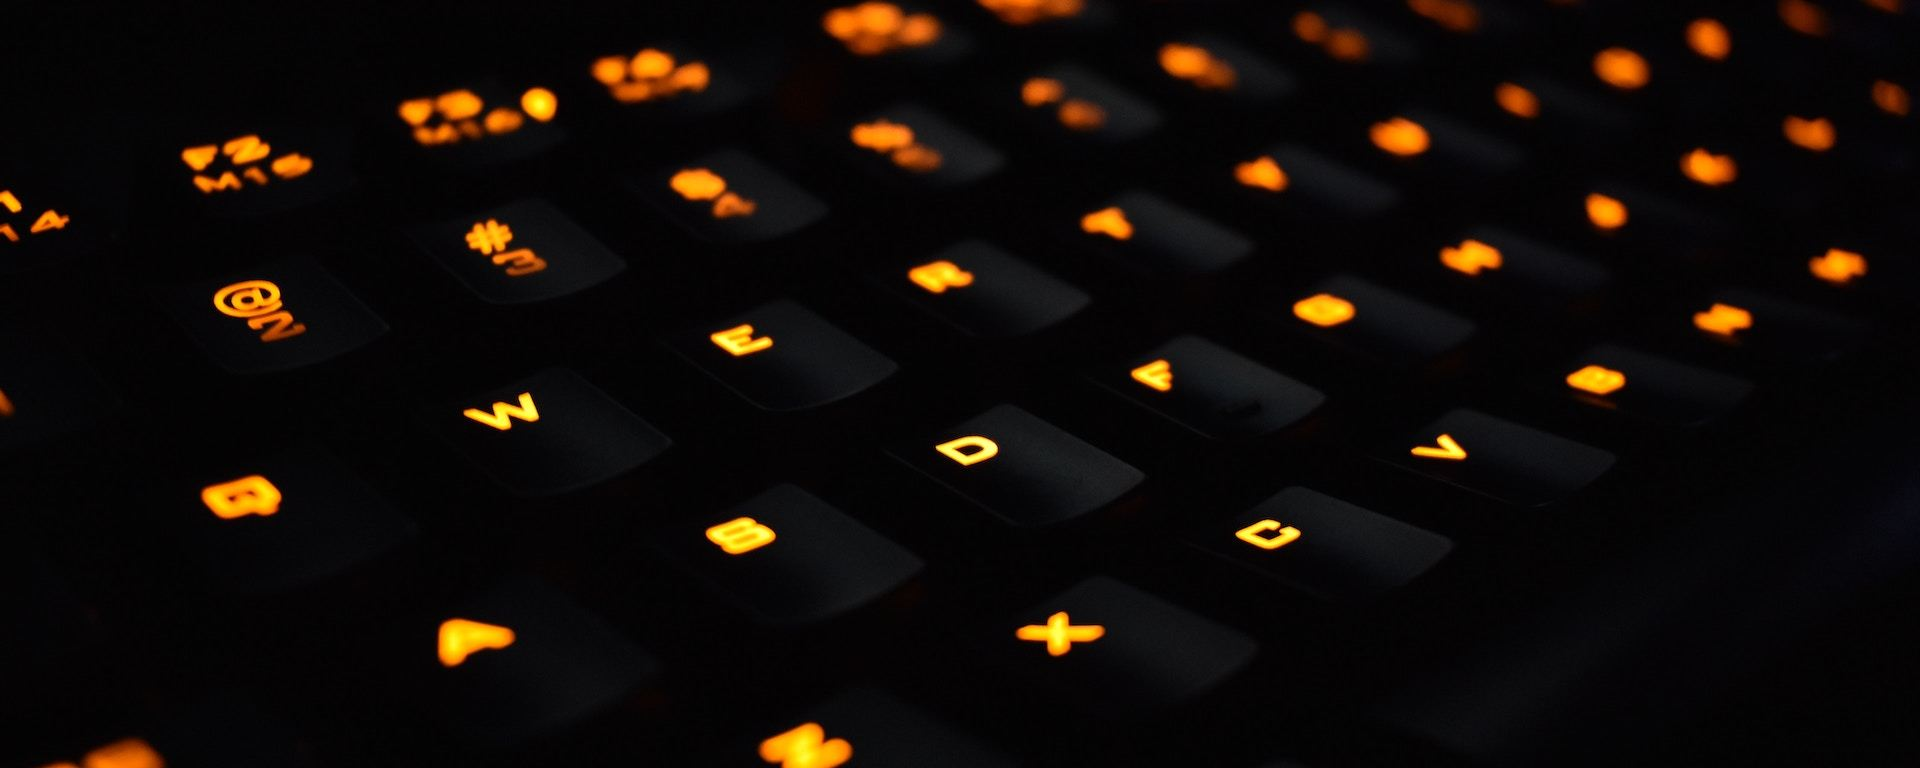 7 best gaming keyboards 2019